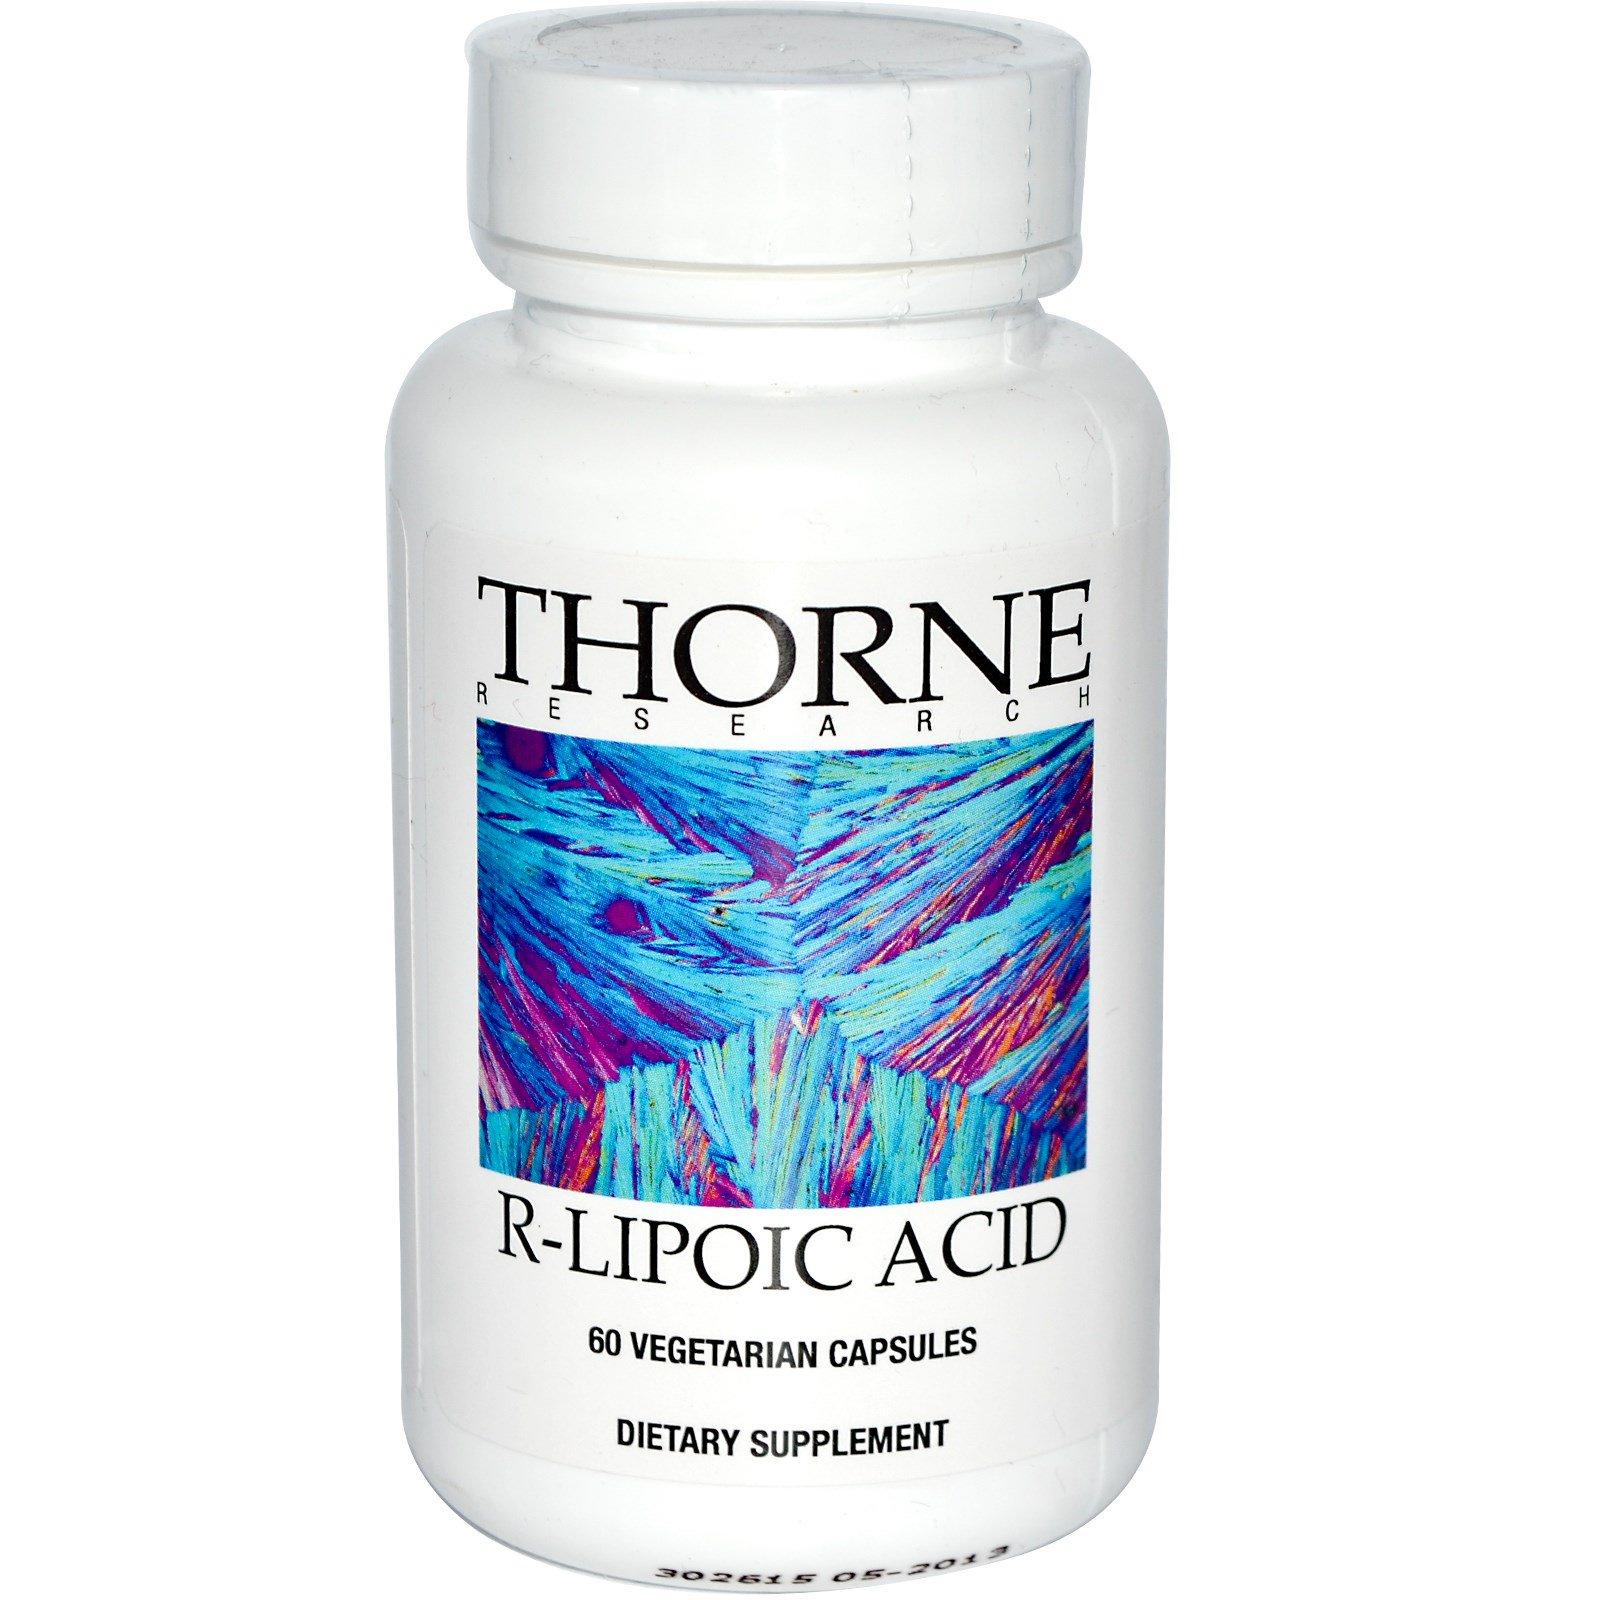 Thorne Research, R-липоевая кислота, 60 вегетарианских капсул